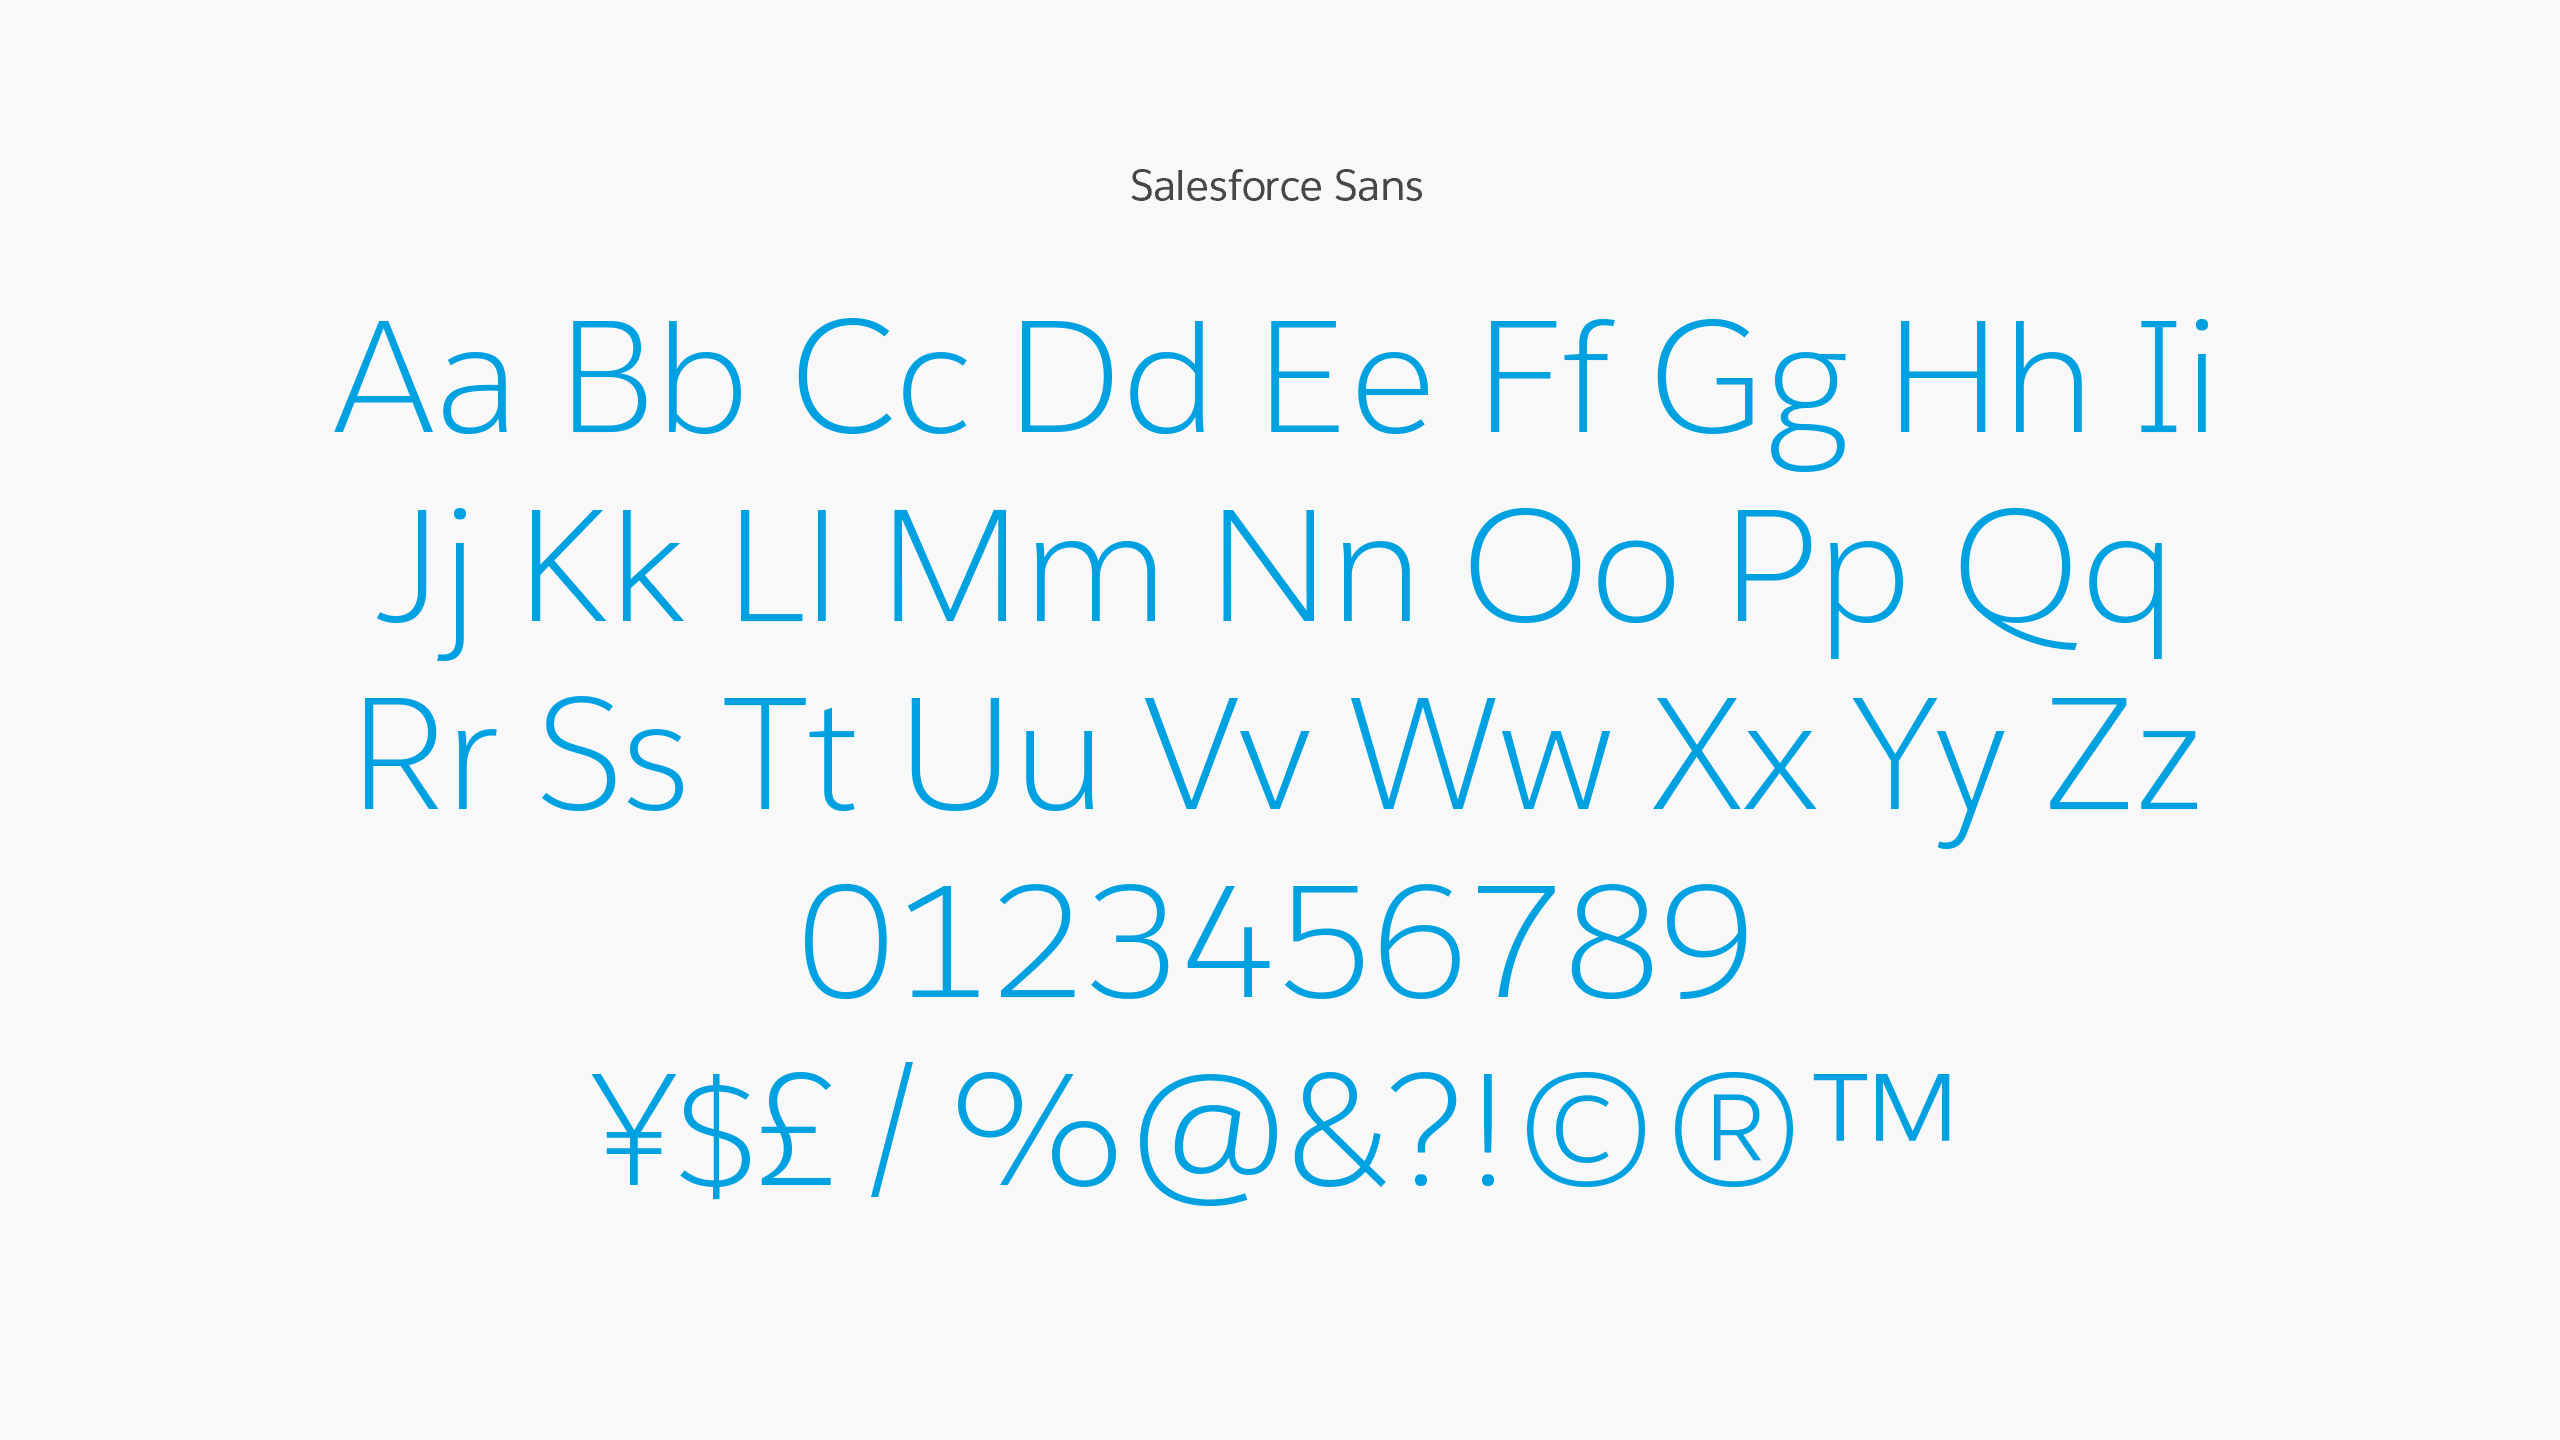 salesforce-brand-font-specimen-alphabet